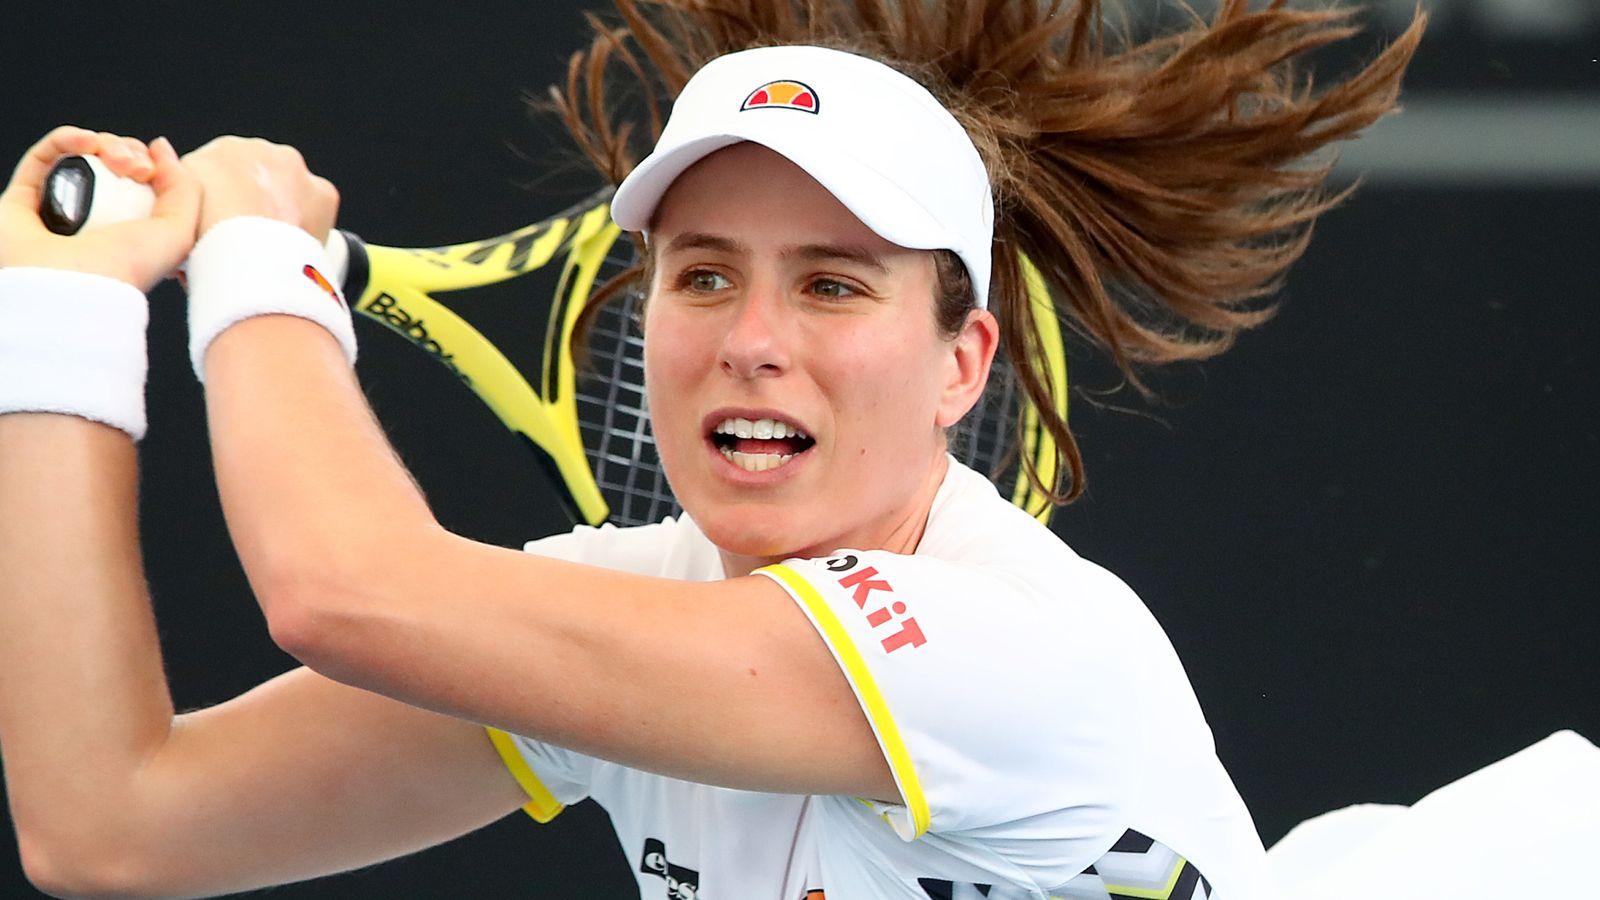 Johanna Konta through to semi-finals of the Monterrey Open